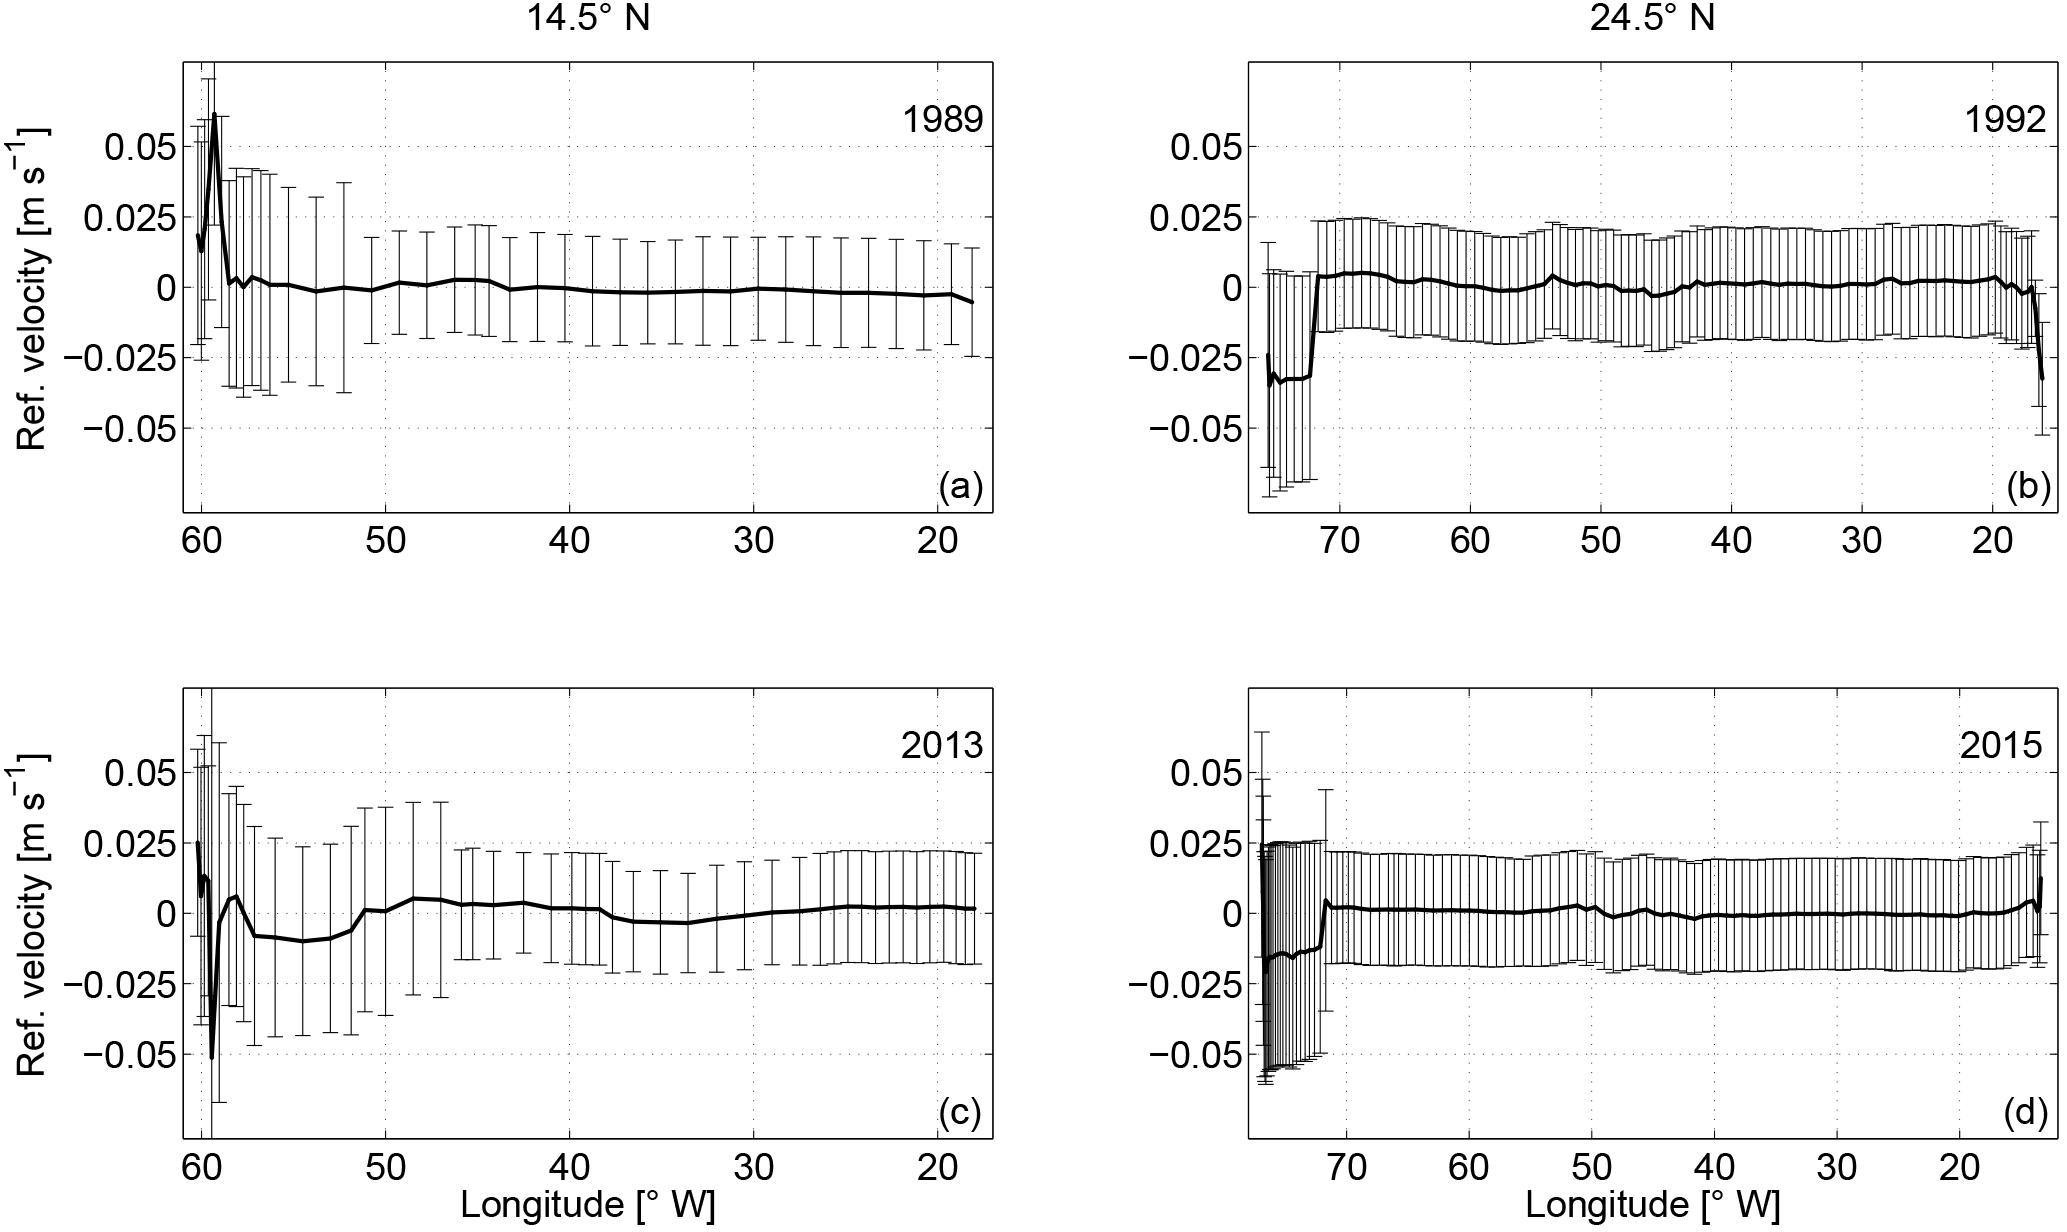 OS - Atlantic Meridional Overturning Circulation at 14 5° N in 1989